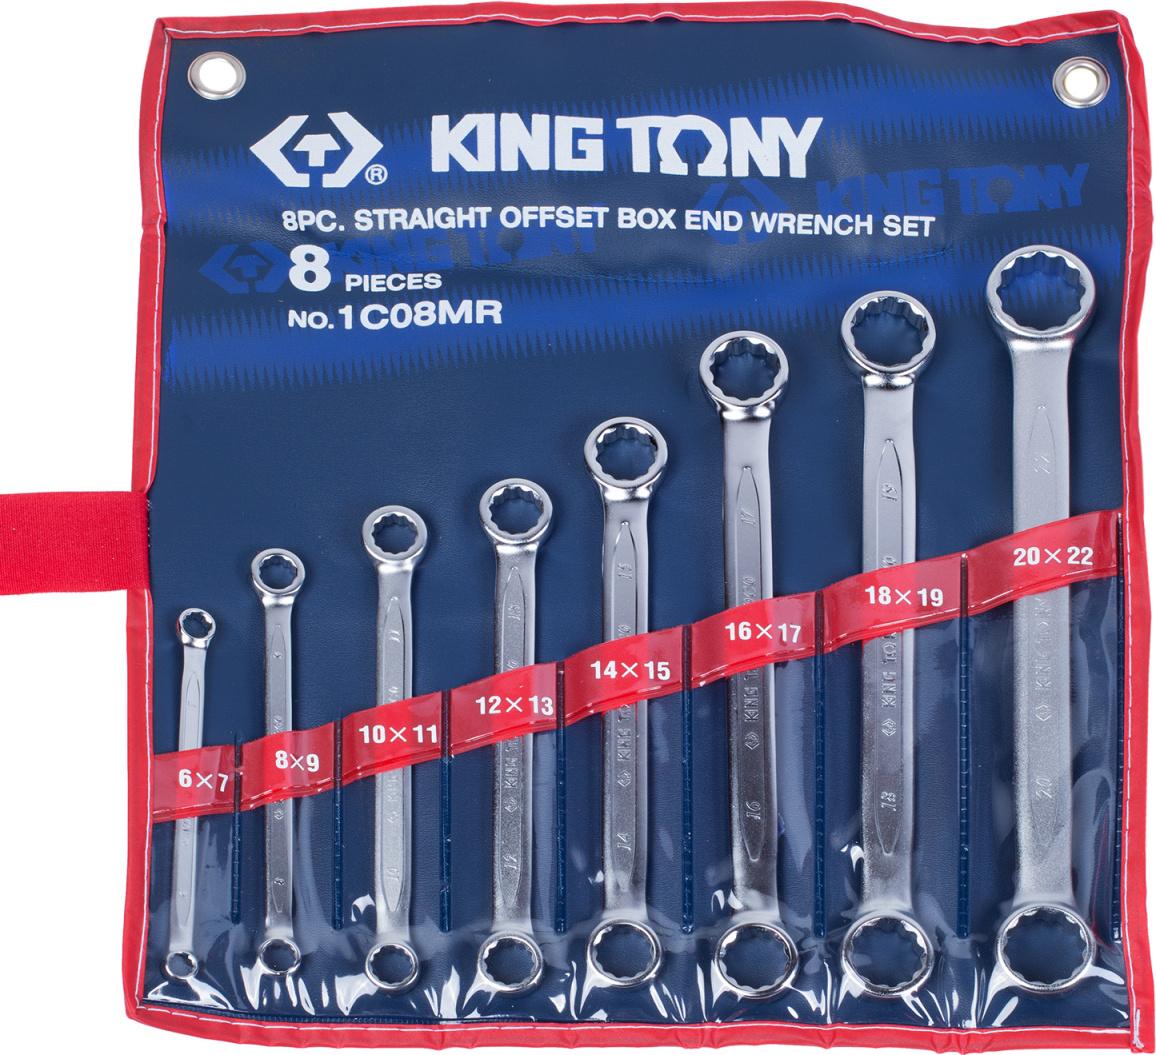 Набор ключей KING TONY 1C08MR